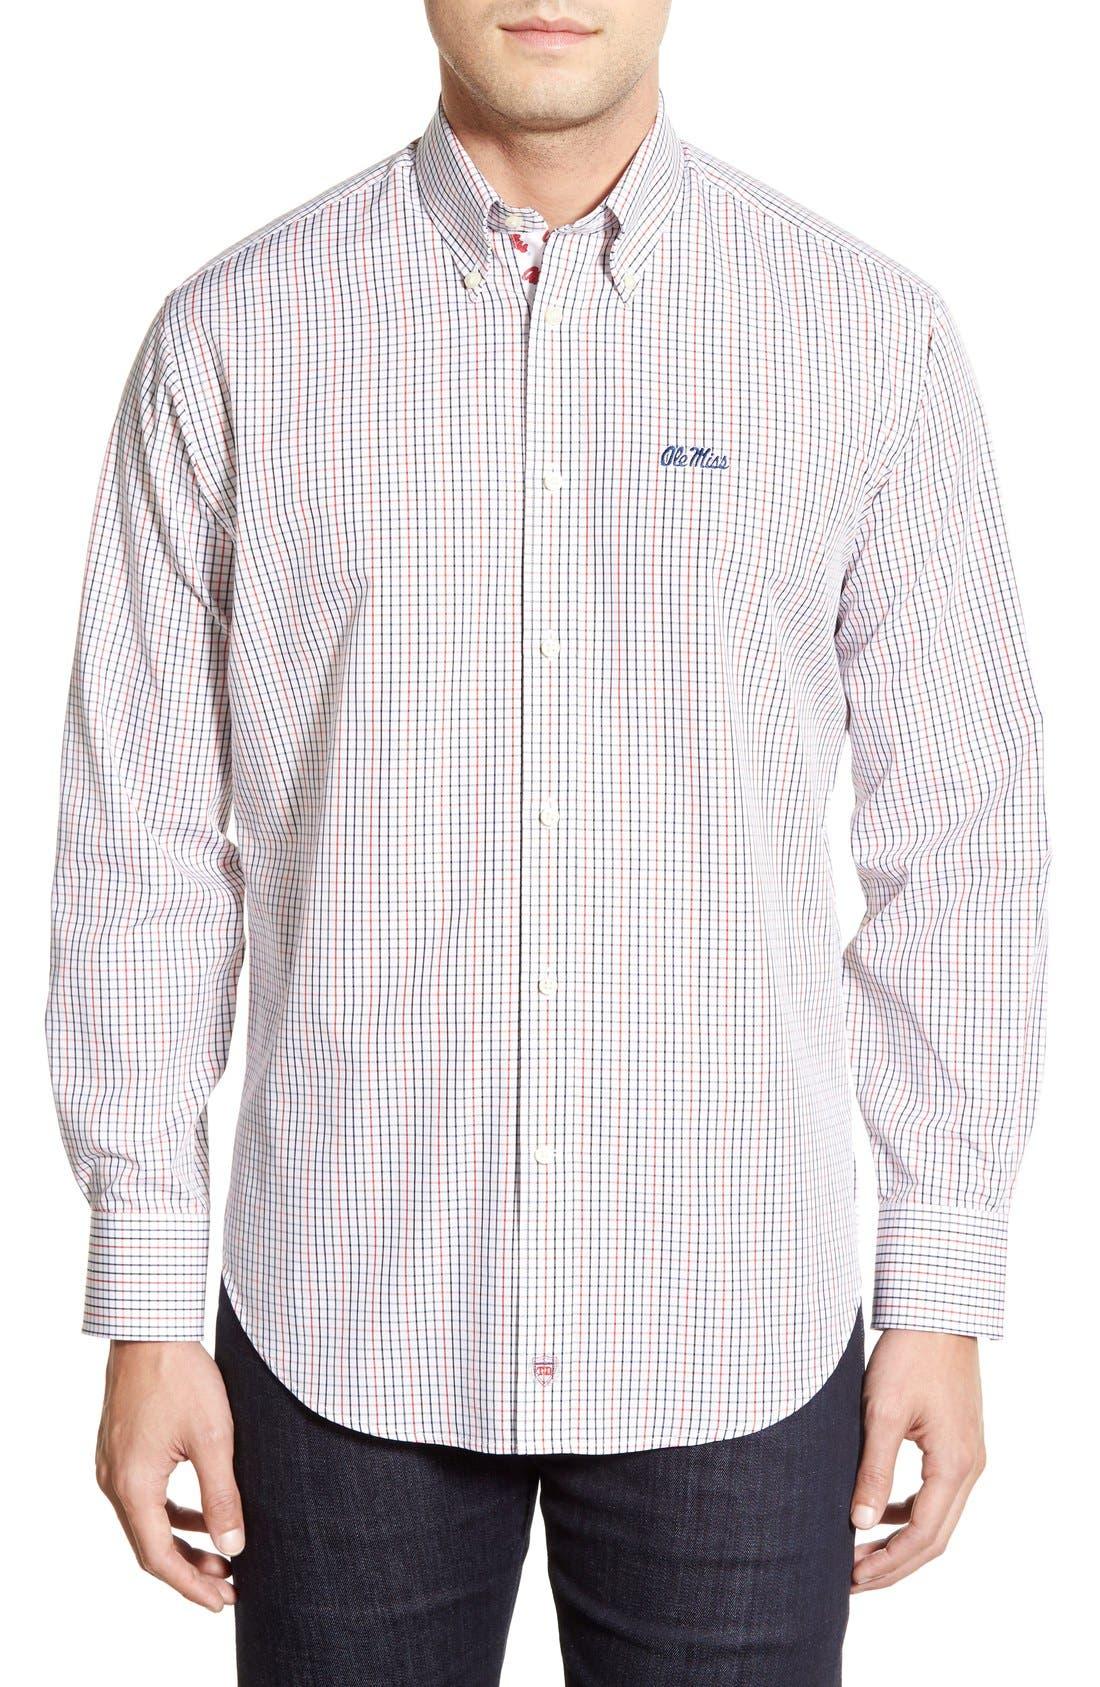 Thomas Dean 'Ole Miss Rebels' Regular Fit Long Sleeve Tattersall Sport Shirt